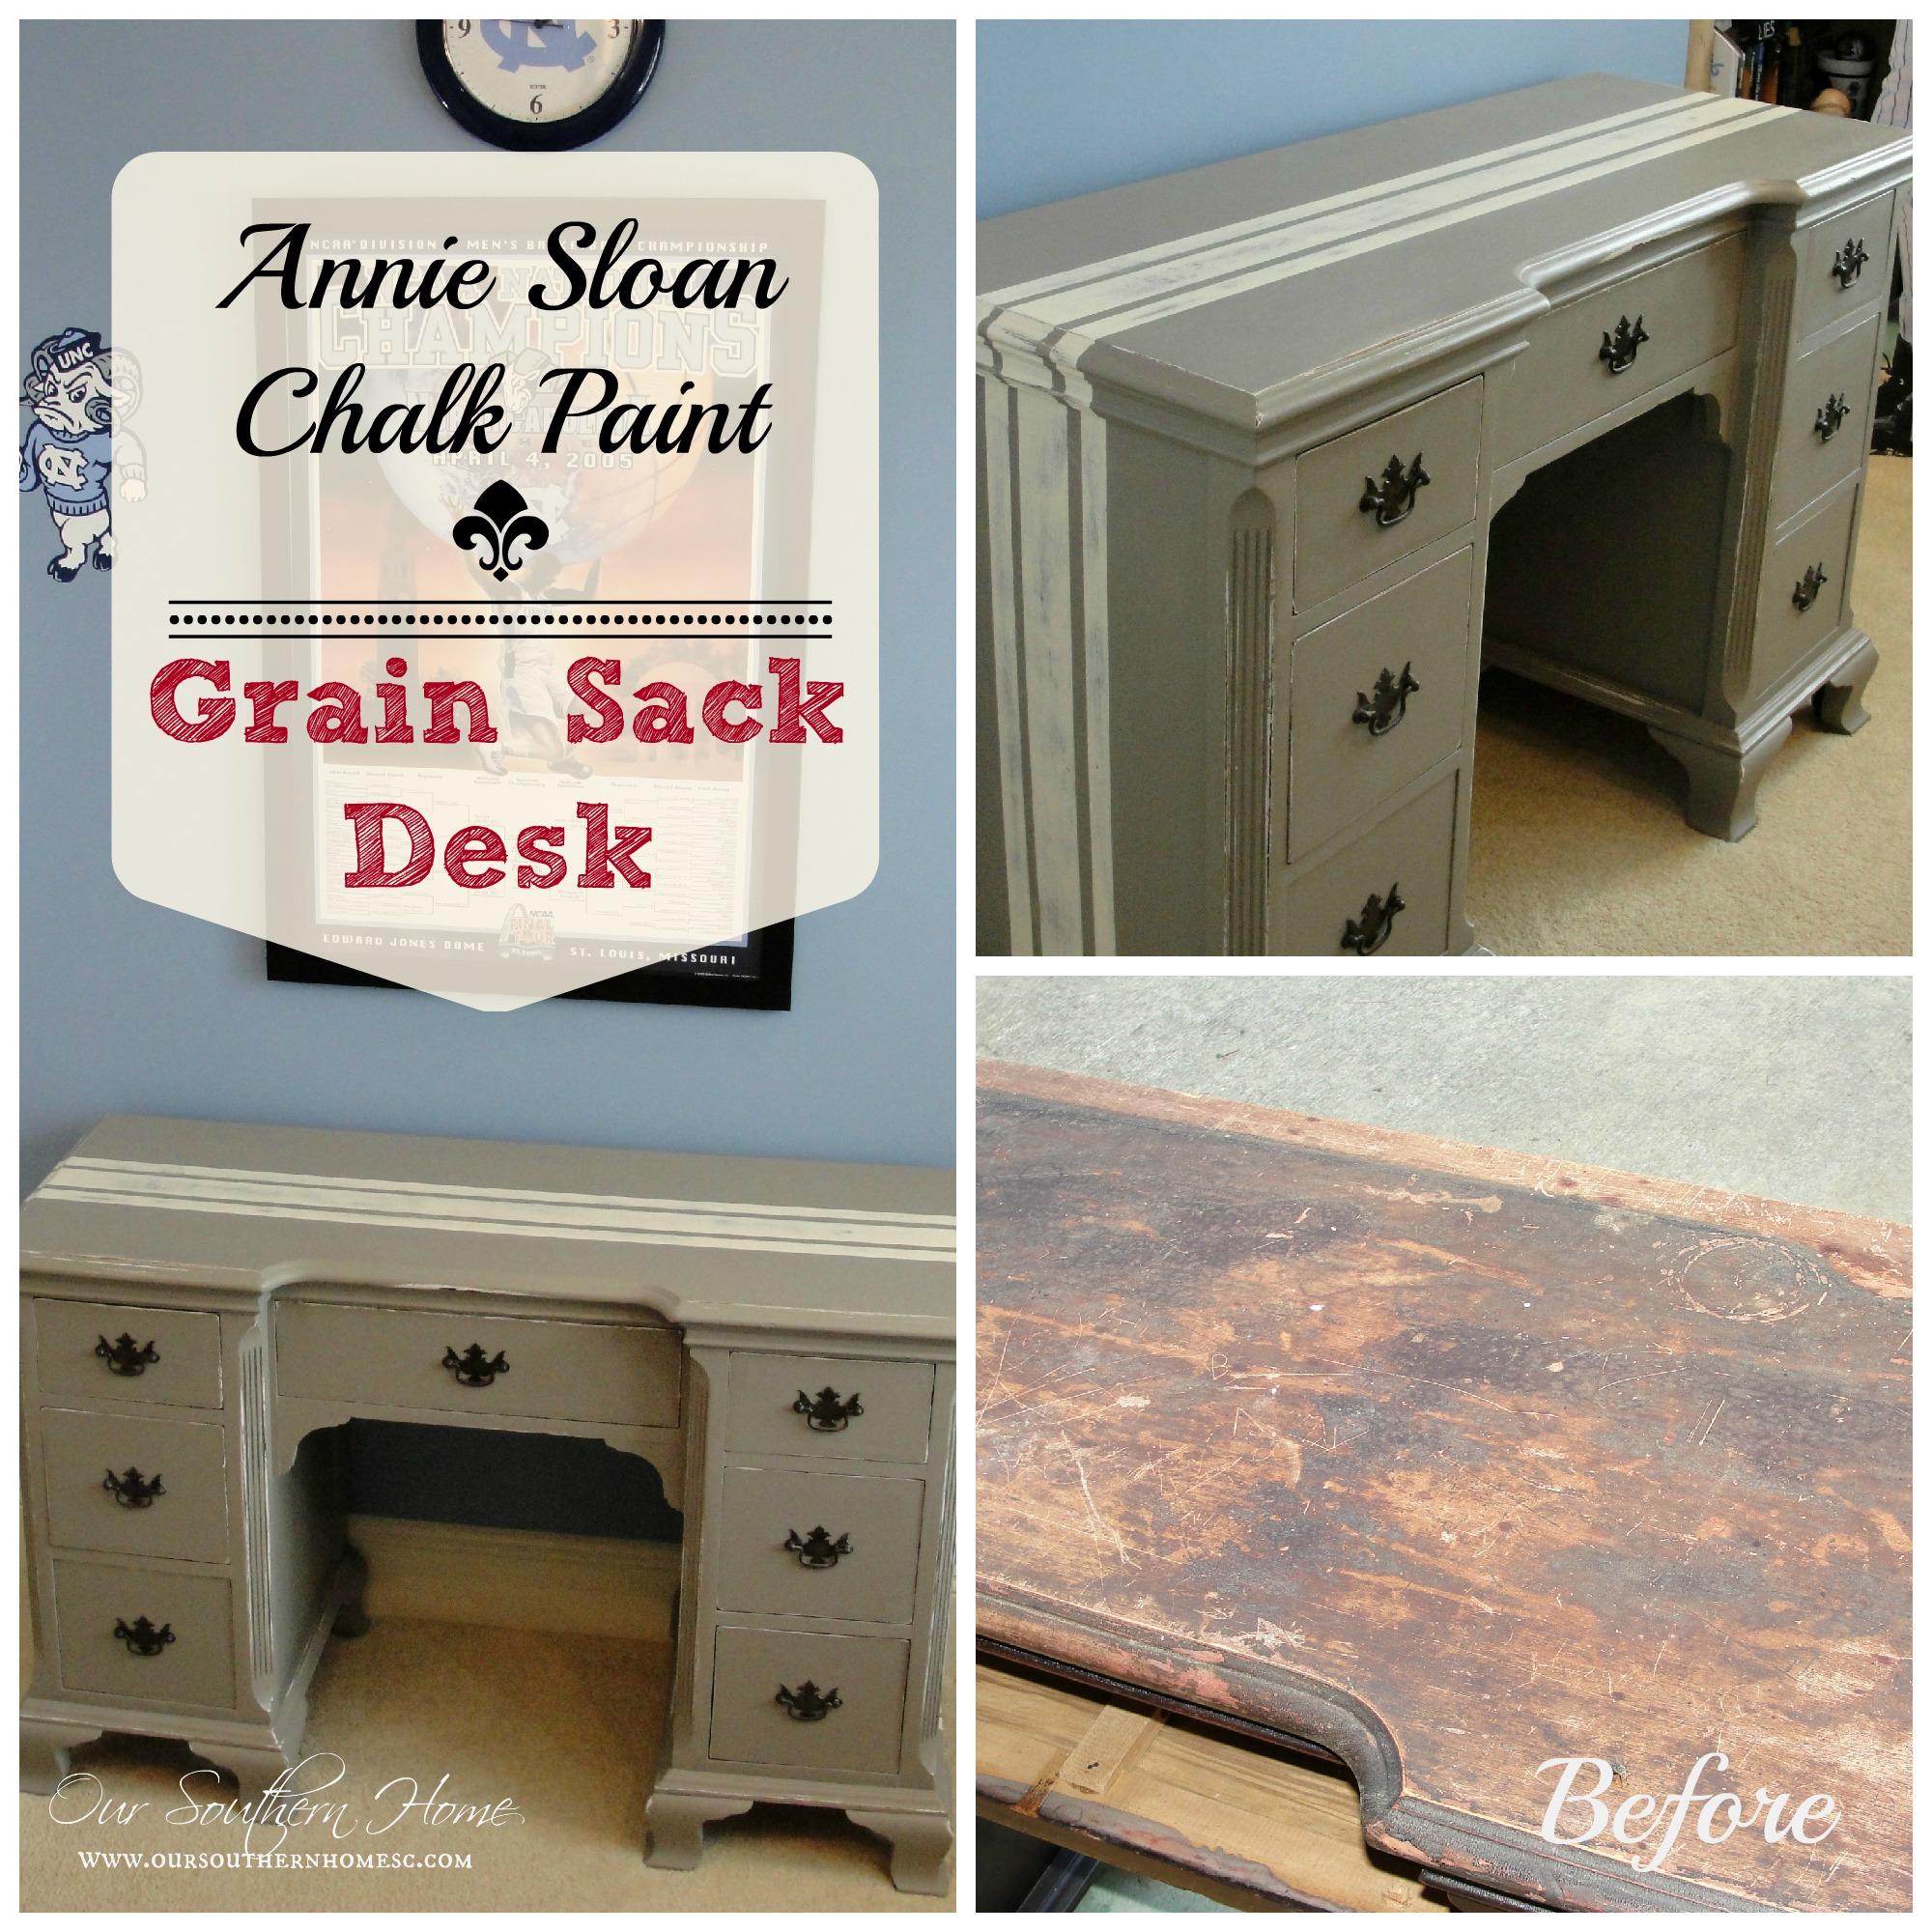 . Grain Sack Desk  Annie Sloan Chalk Paint    Our Southern Home